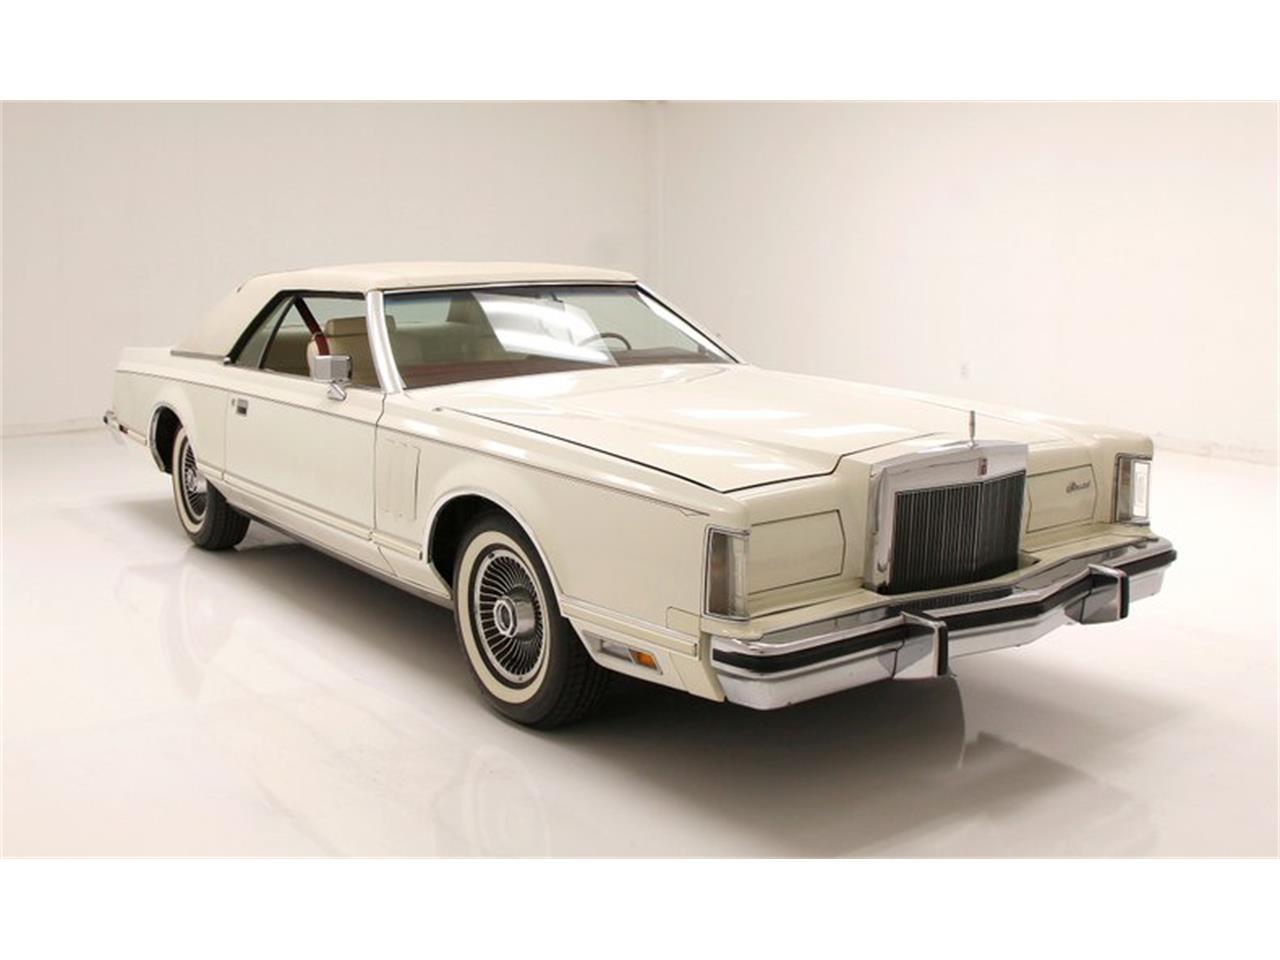 1979 Lincoln Continental (CC-1334875) for sale in Morgantown, Pennsylvania